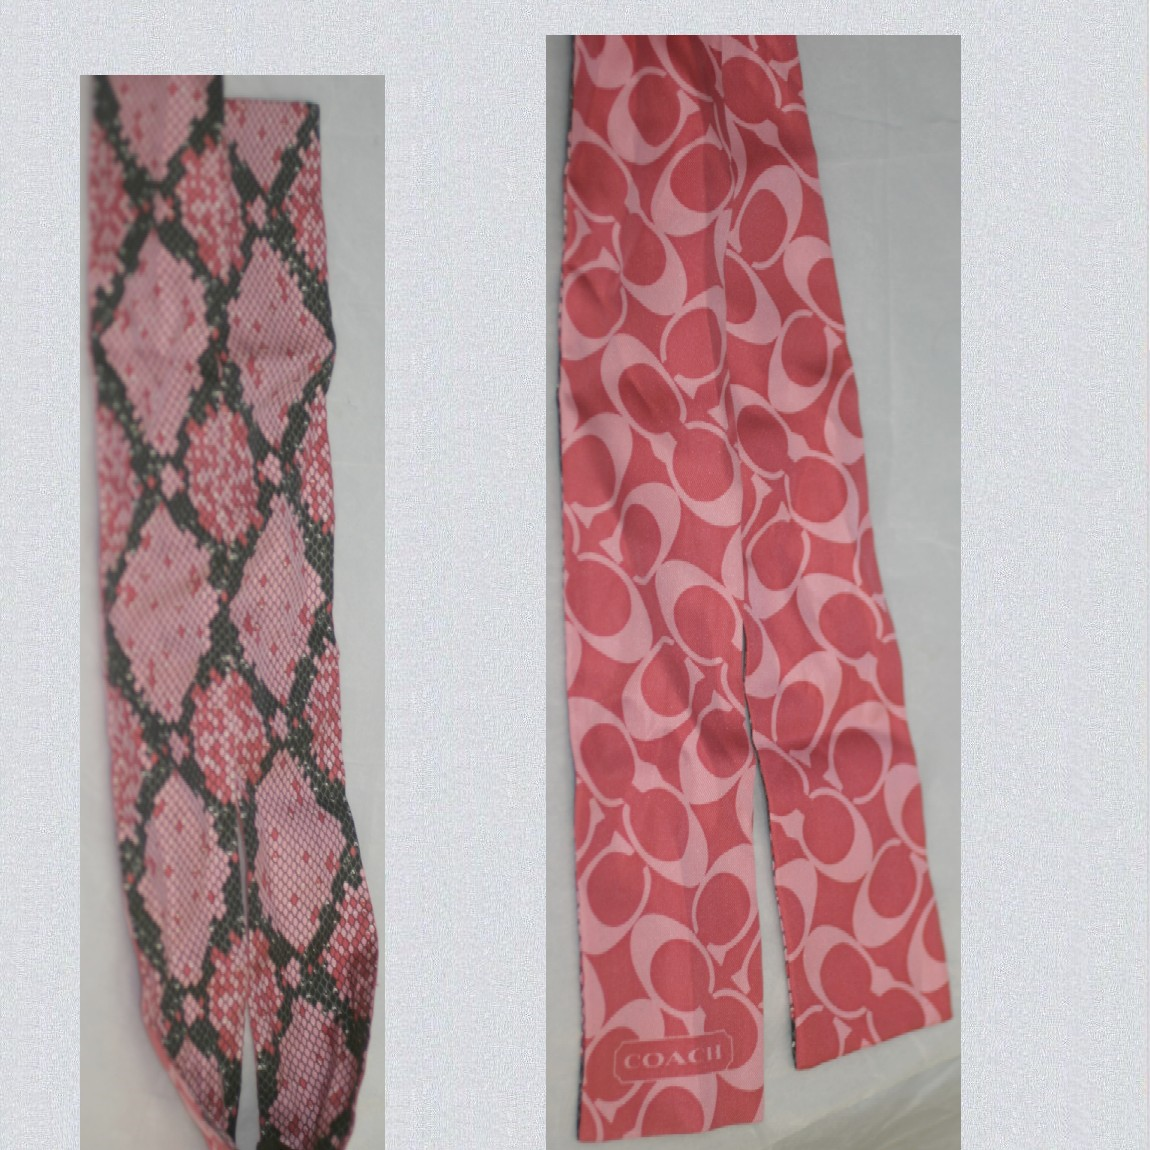 Http Anzenkiki 23537mcmf10007261 Https Tshopr10s Comport Carpet Karpet Mercy B200 Deluxe 12cm Imgrc0062653853